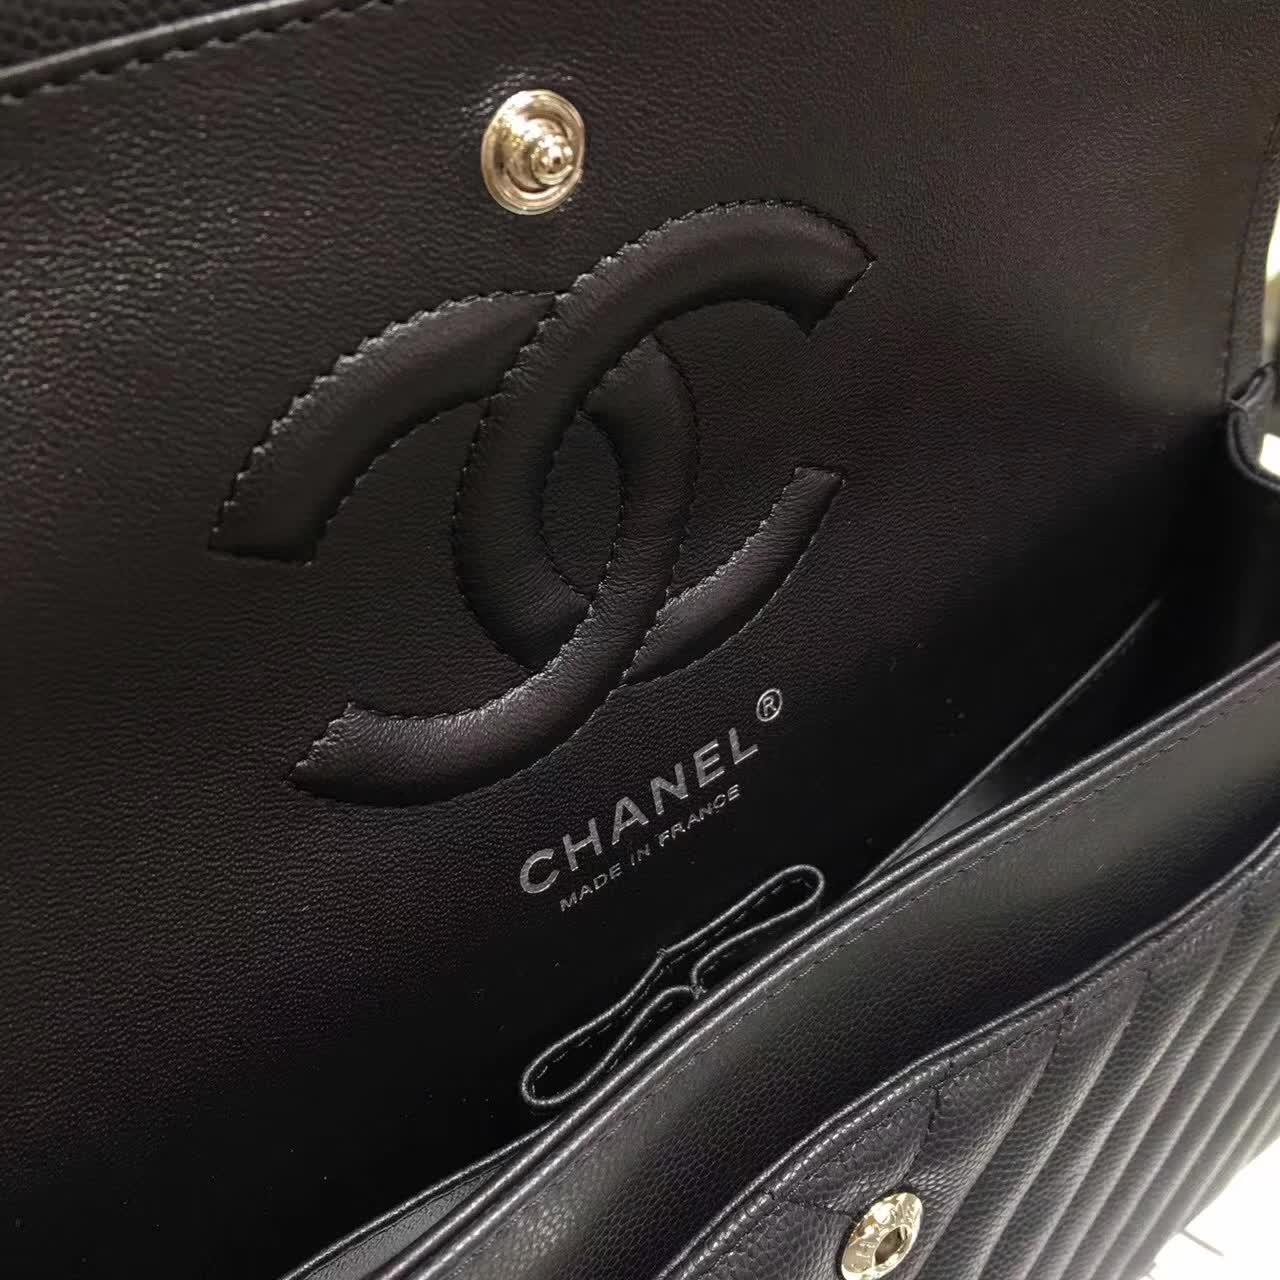 Chanel 香奈儿 V字绣 小鱼子酱 黑色 25cm 五金:银色